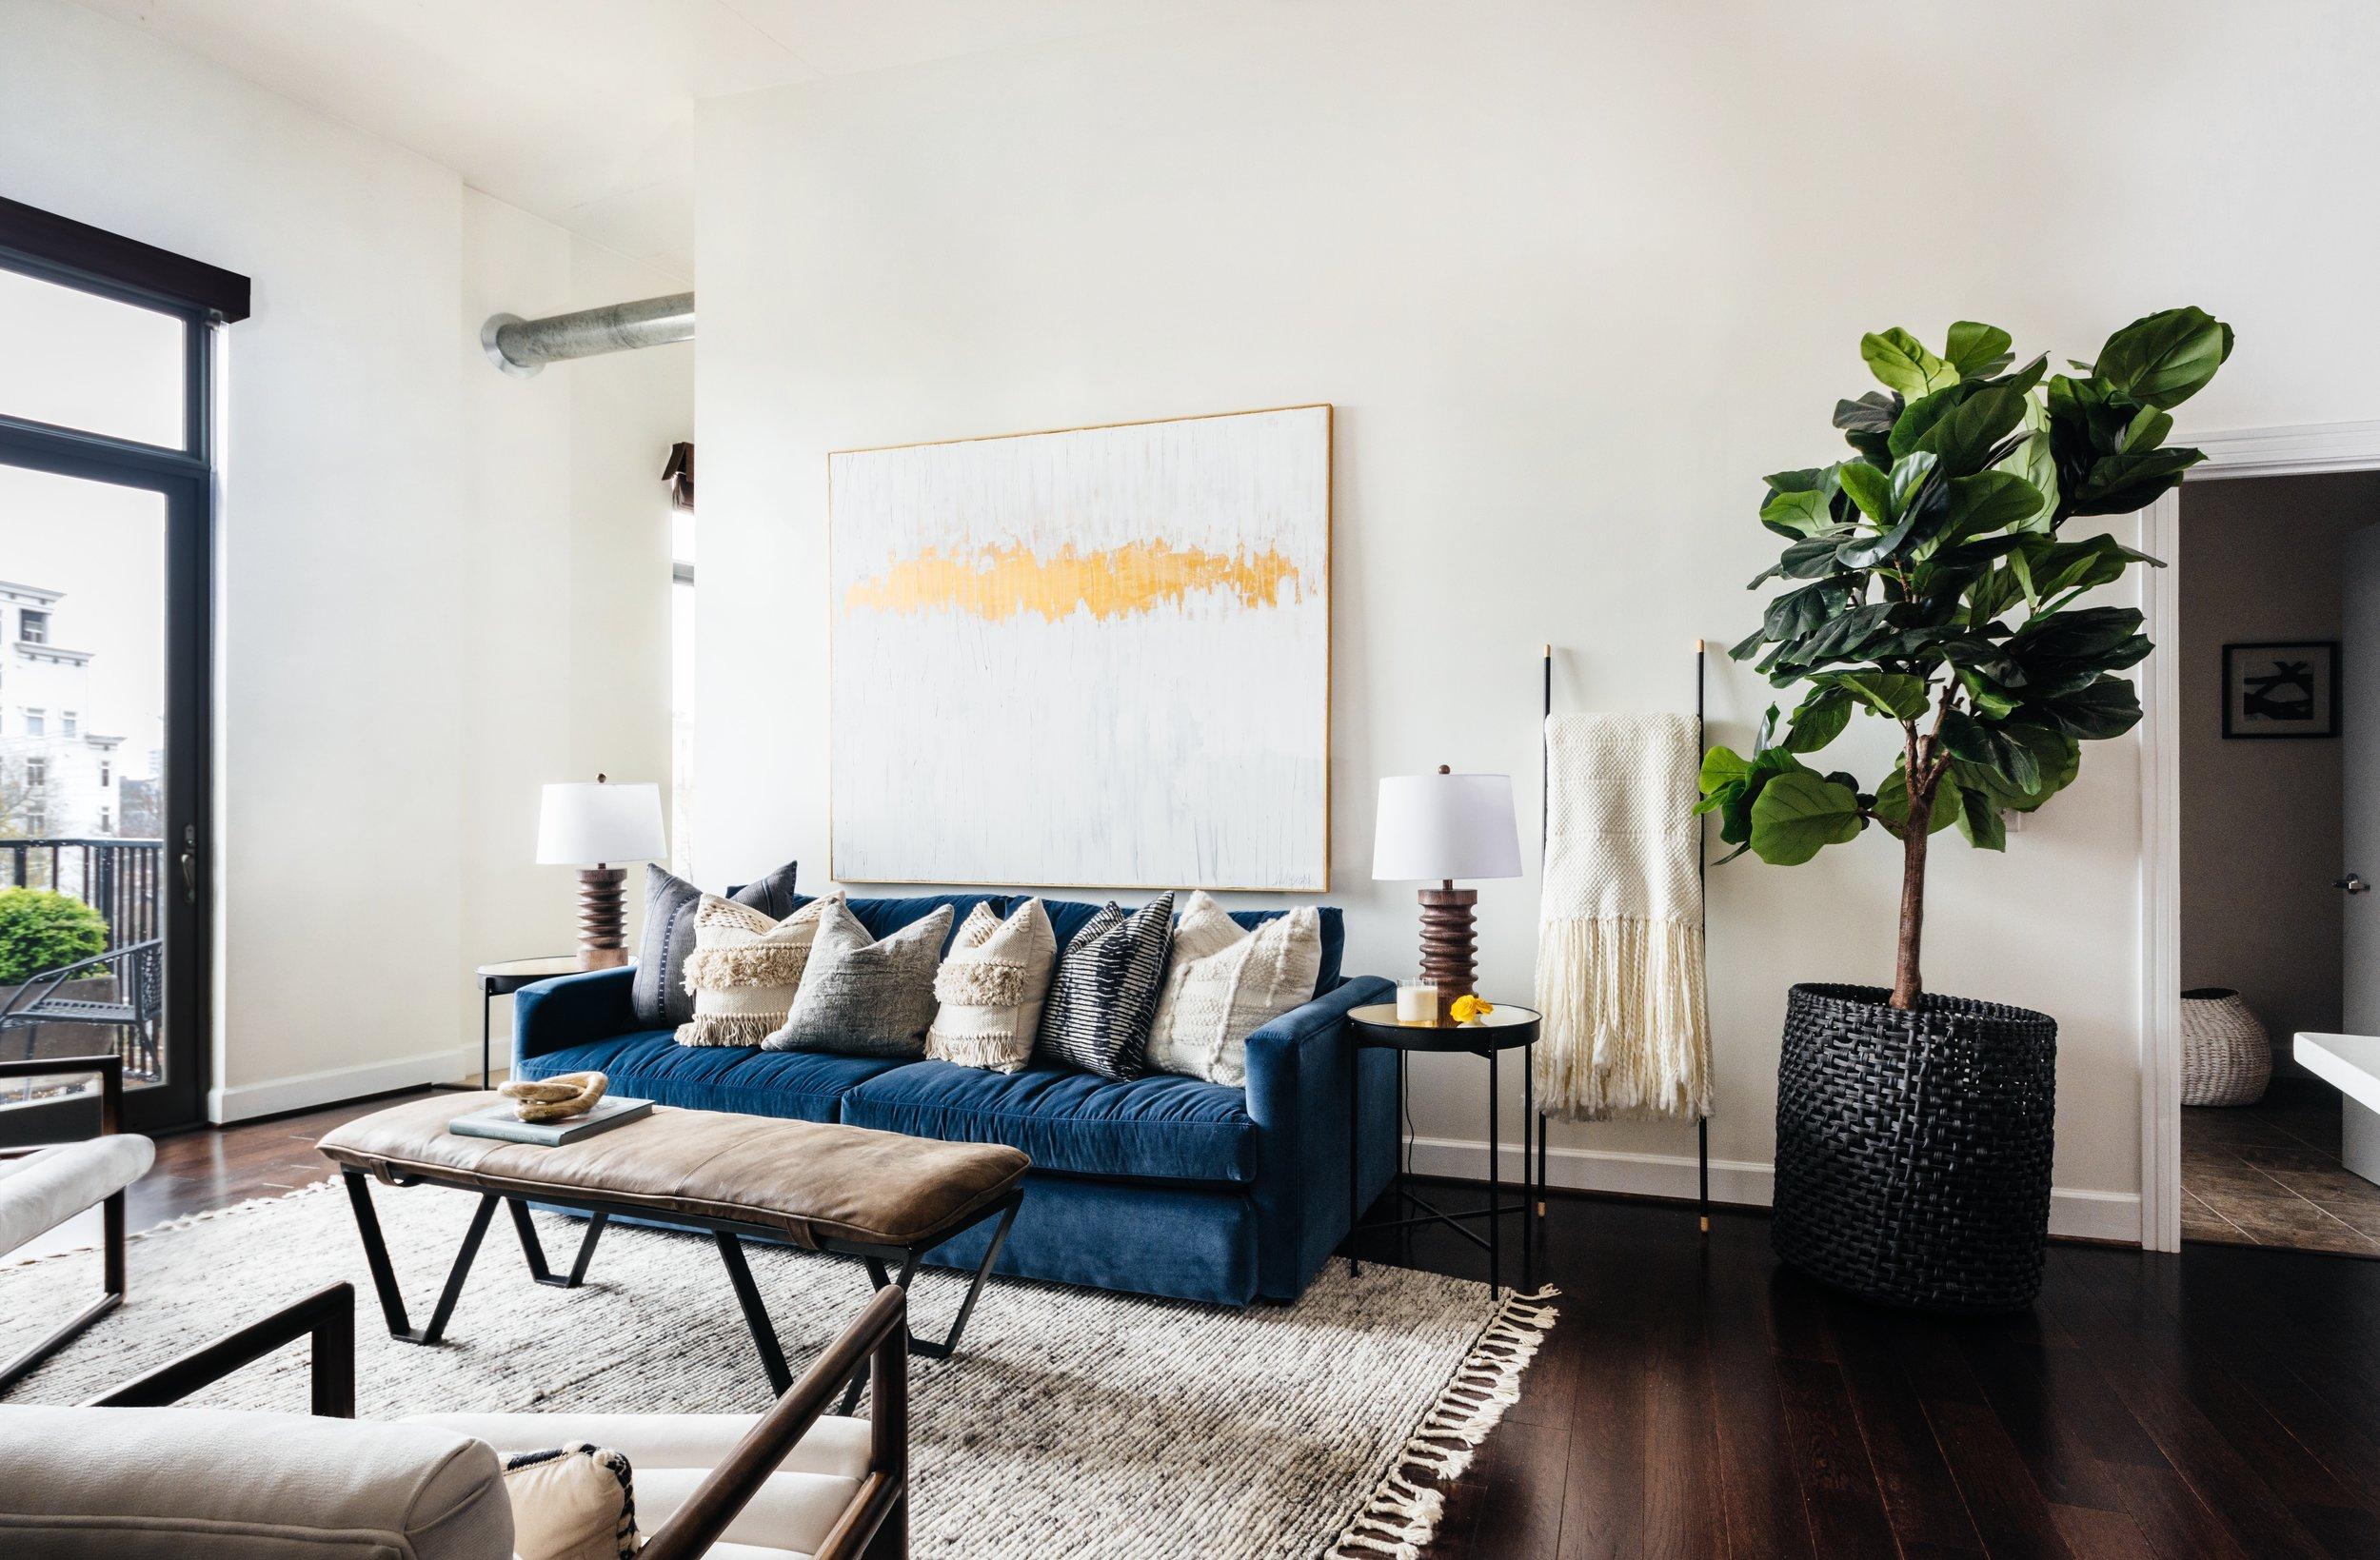 Megan Holt Interiors_Centennial Loft_Quinn Ballard Nashville Interior Photographer-Living Room Composite.jpg